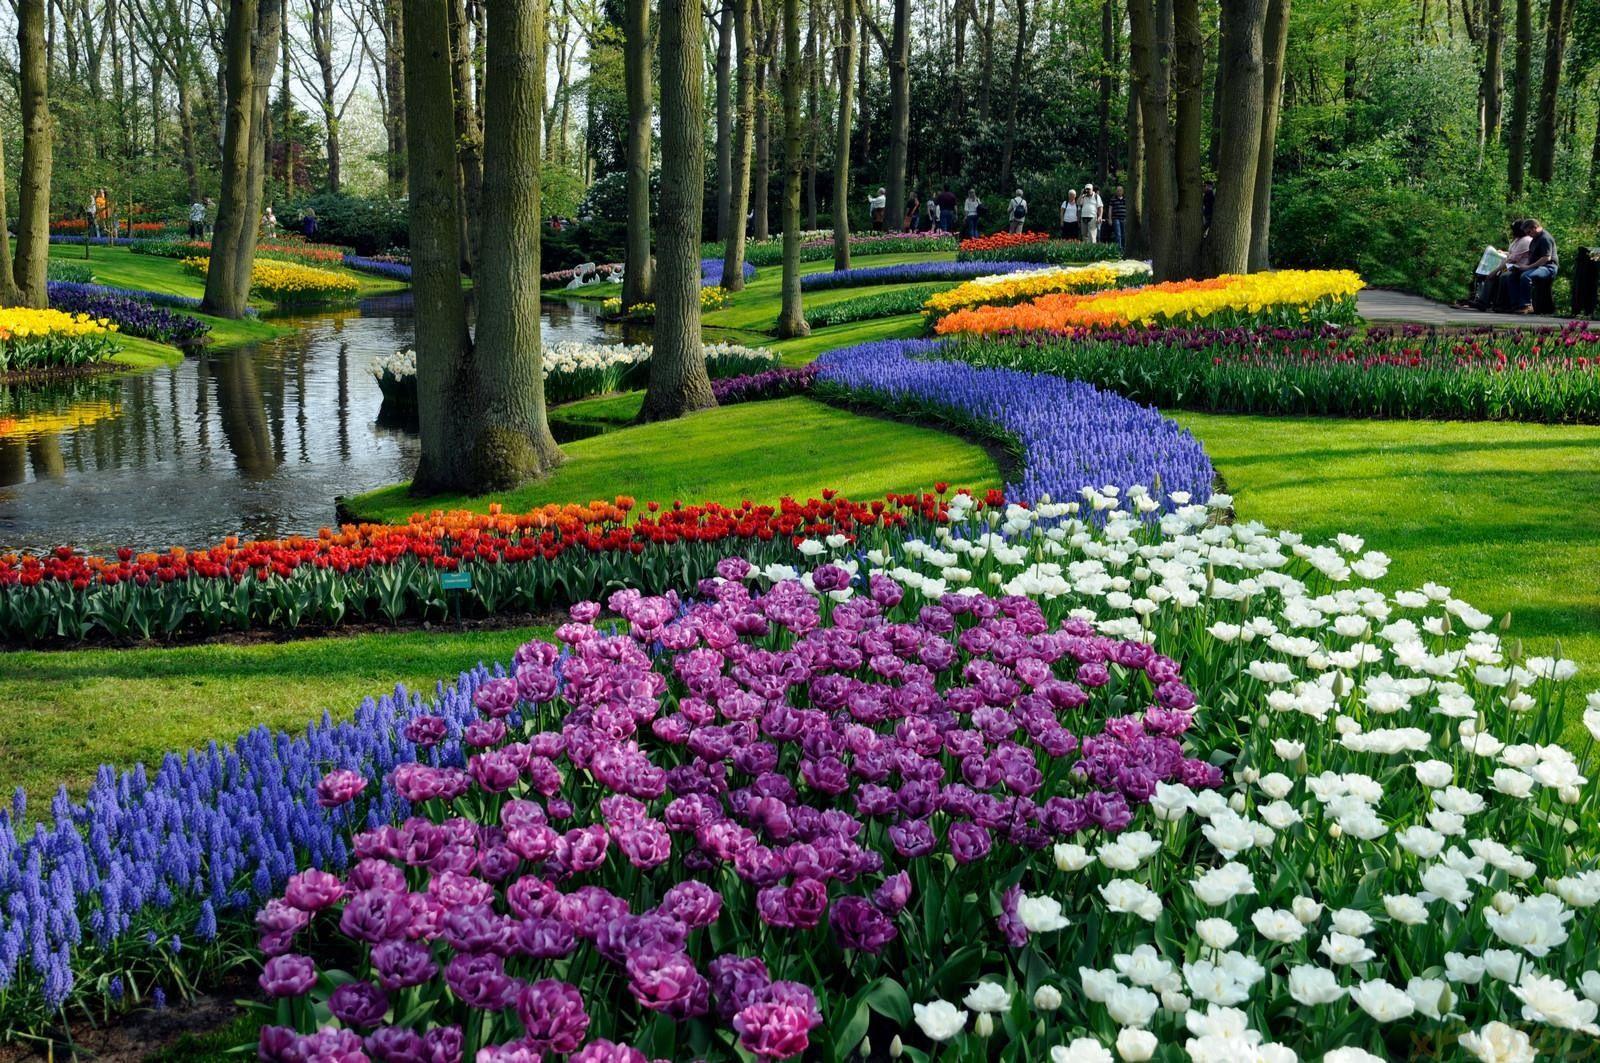 A walk in keukenhof netherlands the most beautiful spring garden a walk in keukenhof netherlands the most beautiful spring garden in the world izmirmasajfo